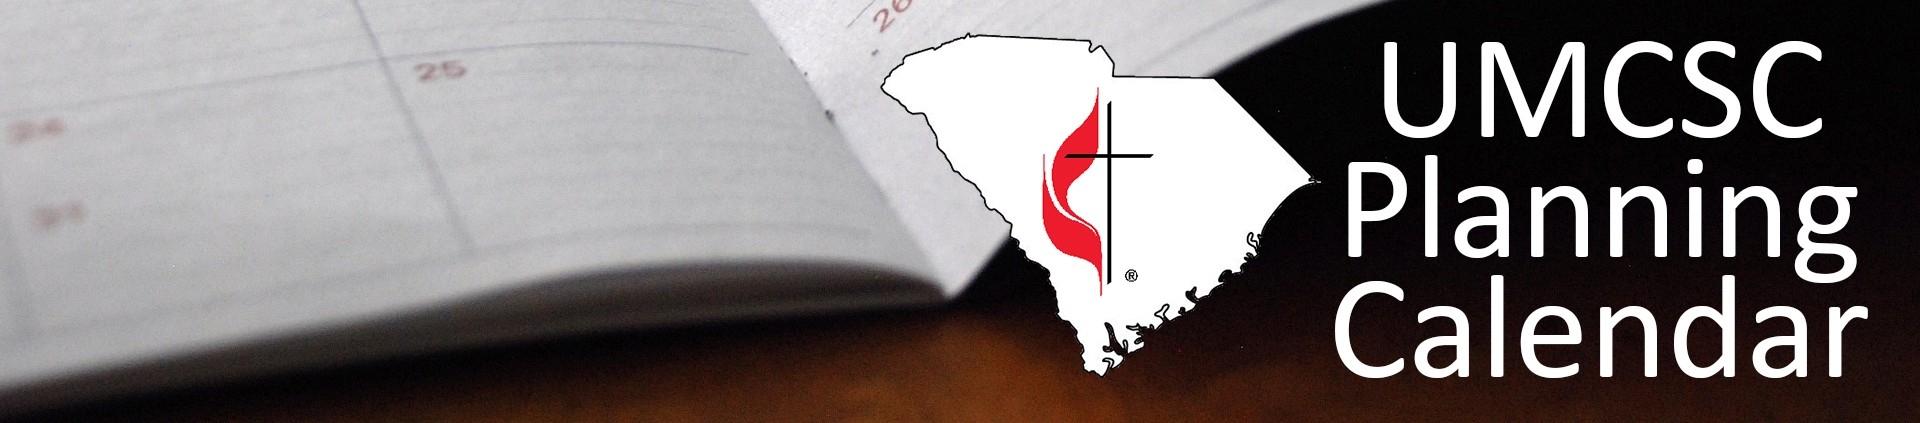 Umcsc Planning Calendar - The South Carolina United  Methodist Lectionary For September 2020